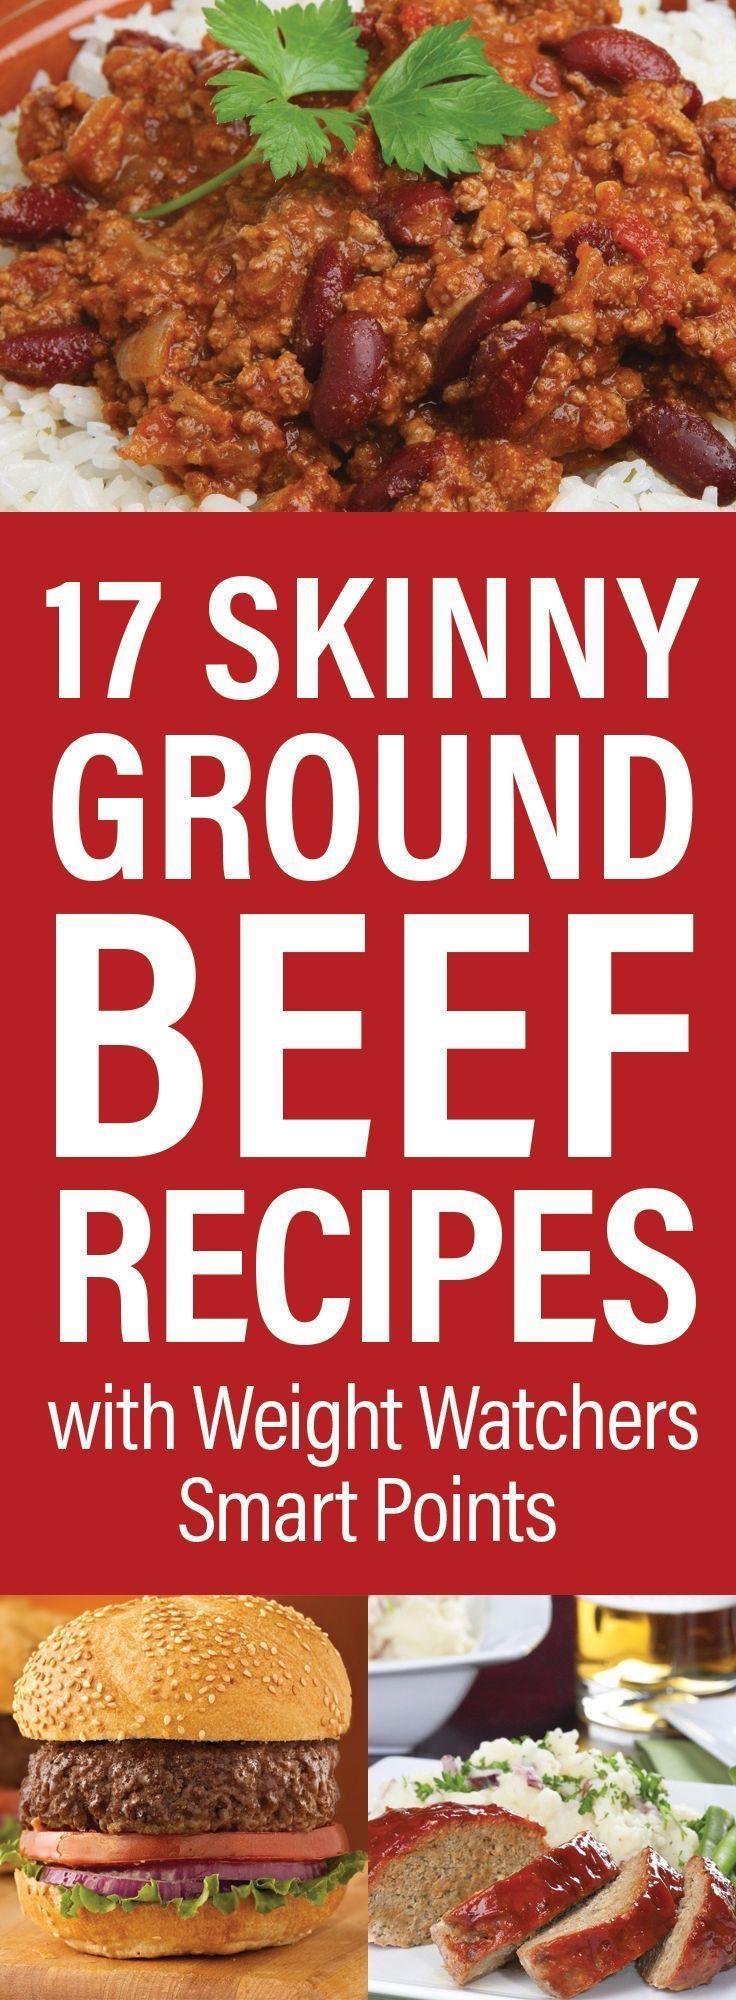 Blue apron weight watchers points - 25 Best Ideas About Weight Watchers Lasagna On Pinterest Weight Watchers Pasta Buffalo Chicken Lasagna And Buff Chicken